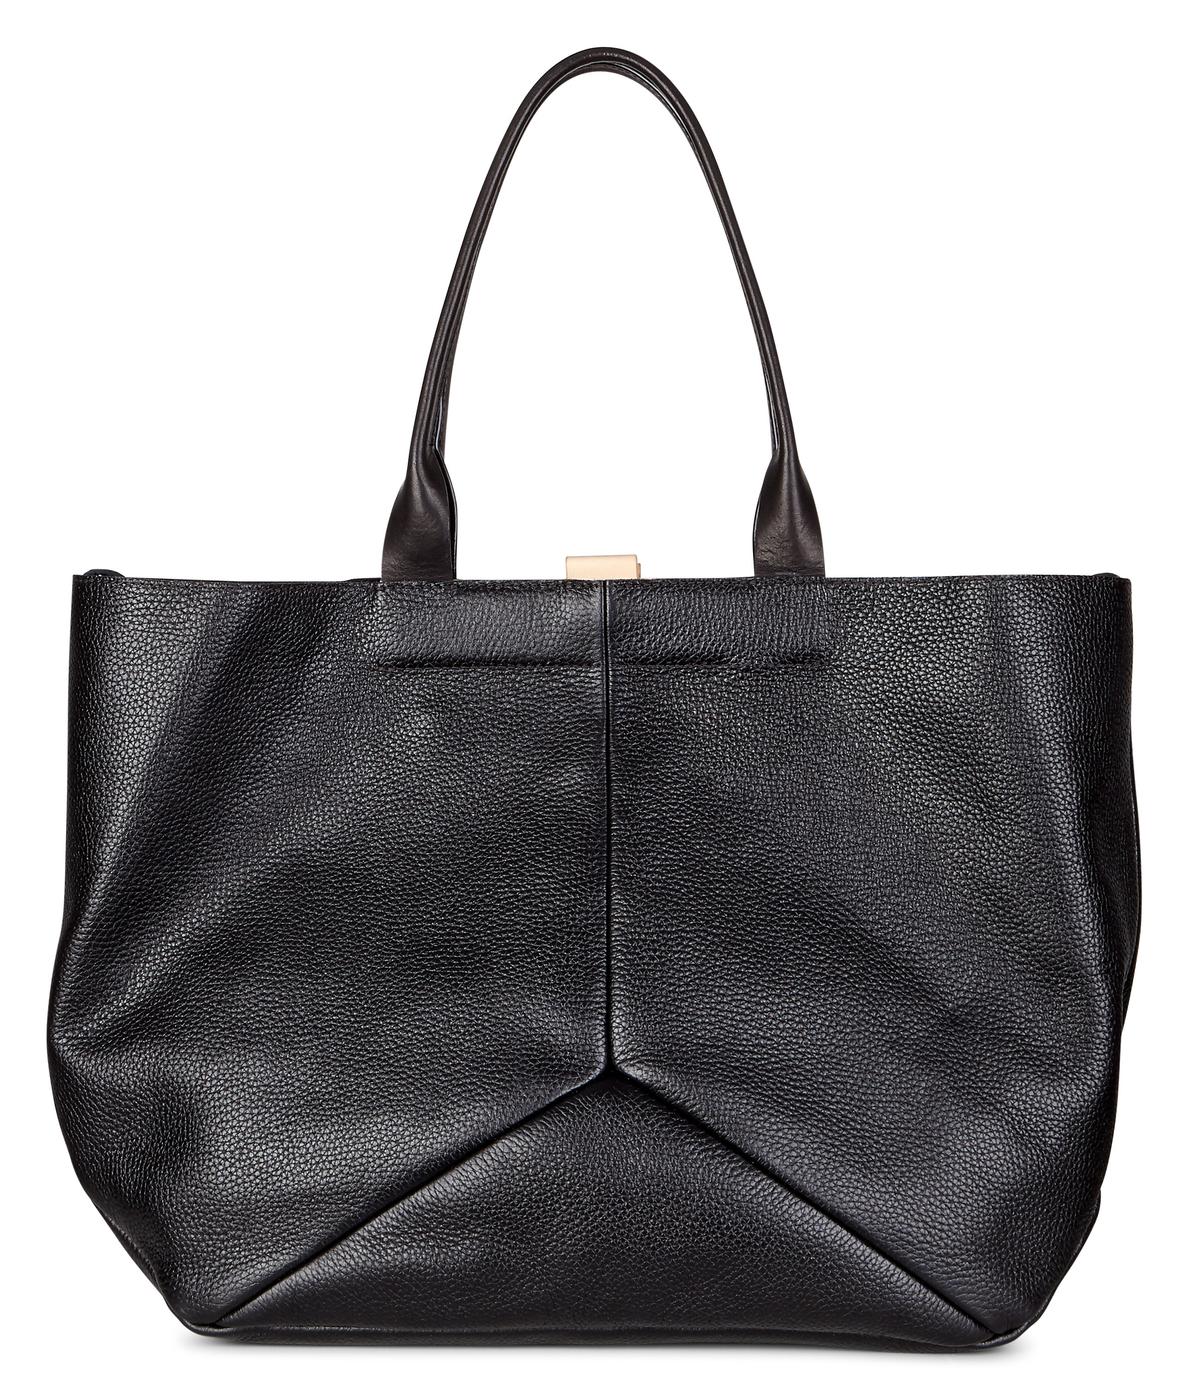 ECCO ELLA Hexagon Shopper Bag